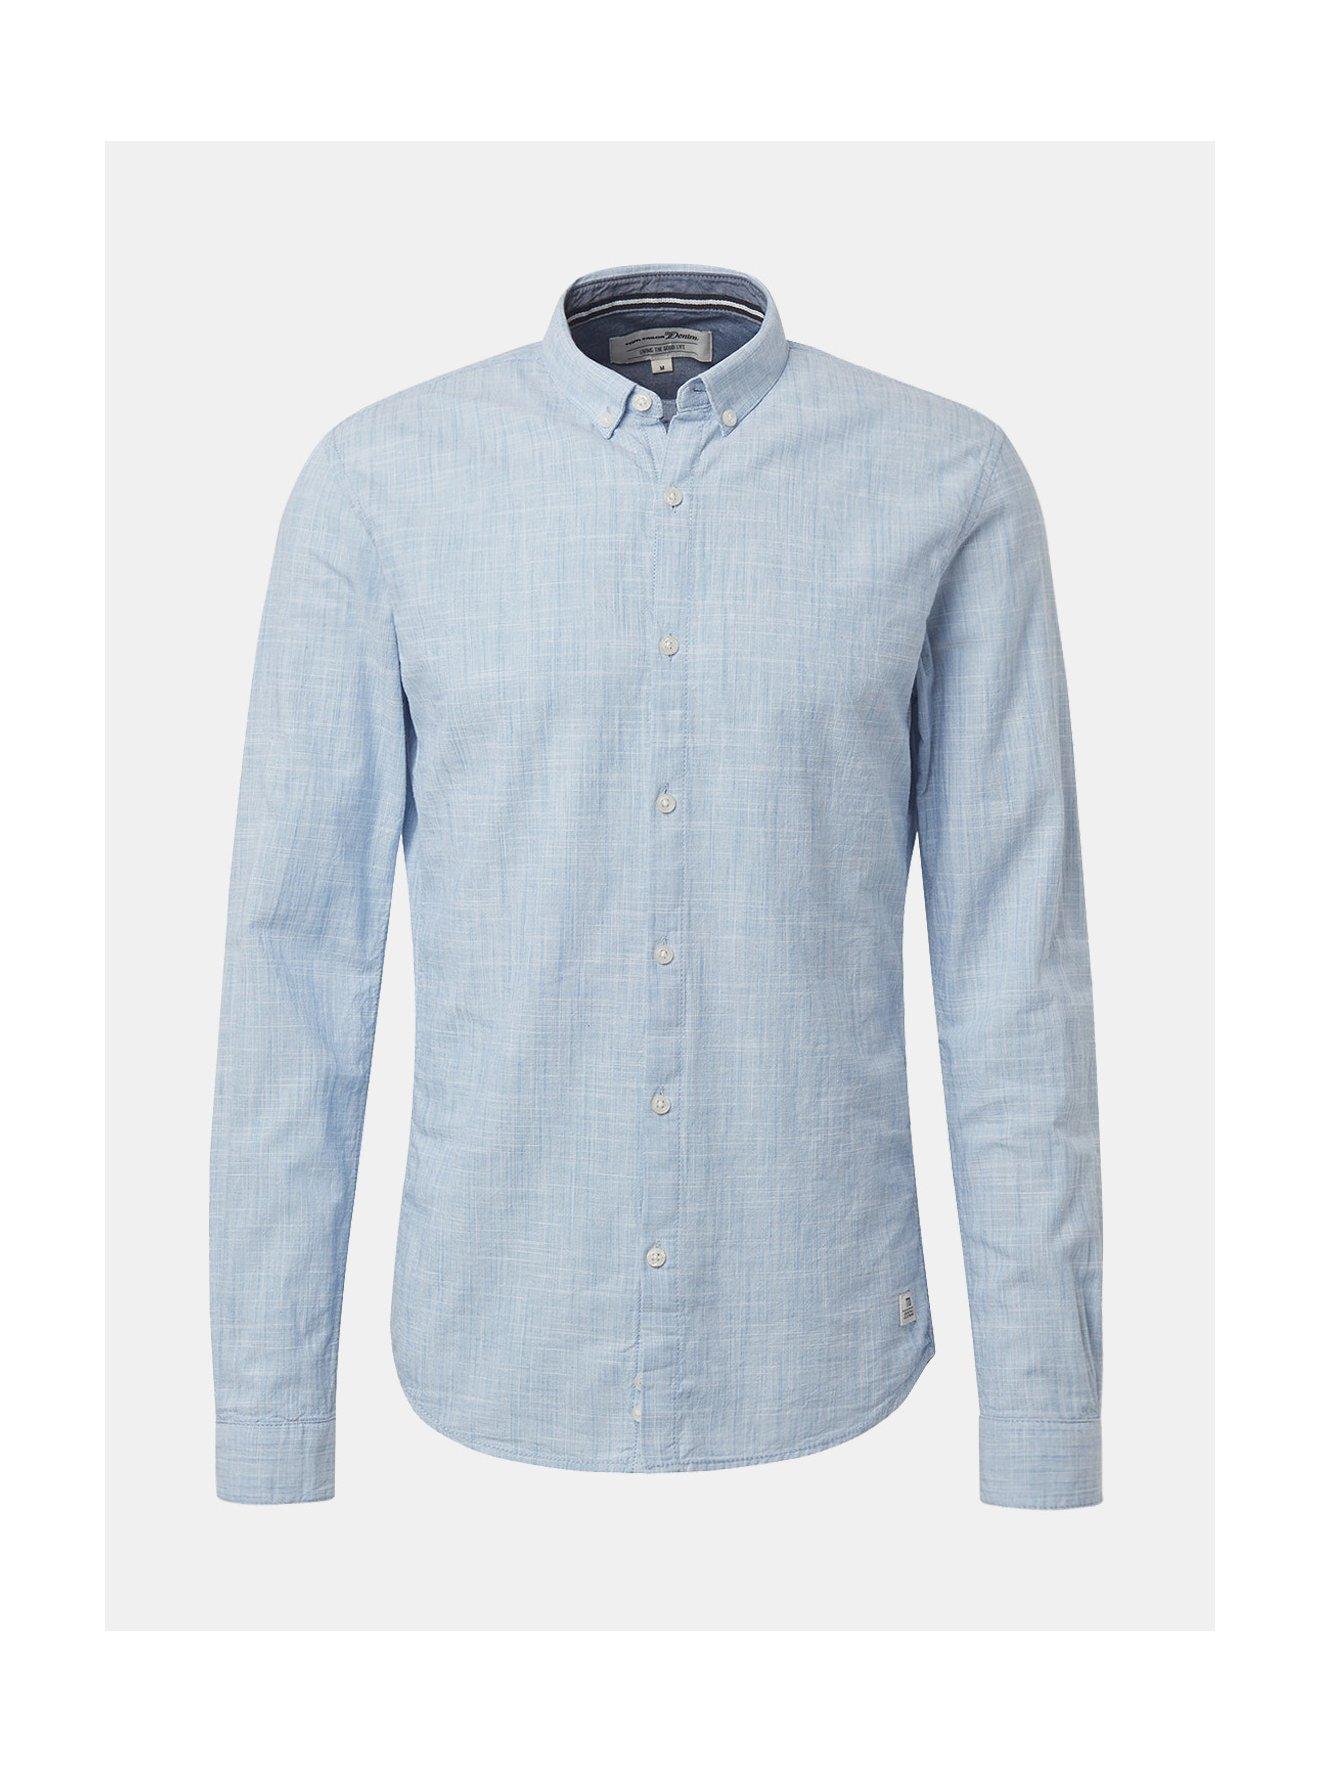 c8999bda3a0e Světle modrá pánská žíhaná košile Tom Tailor Denim